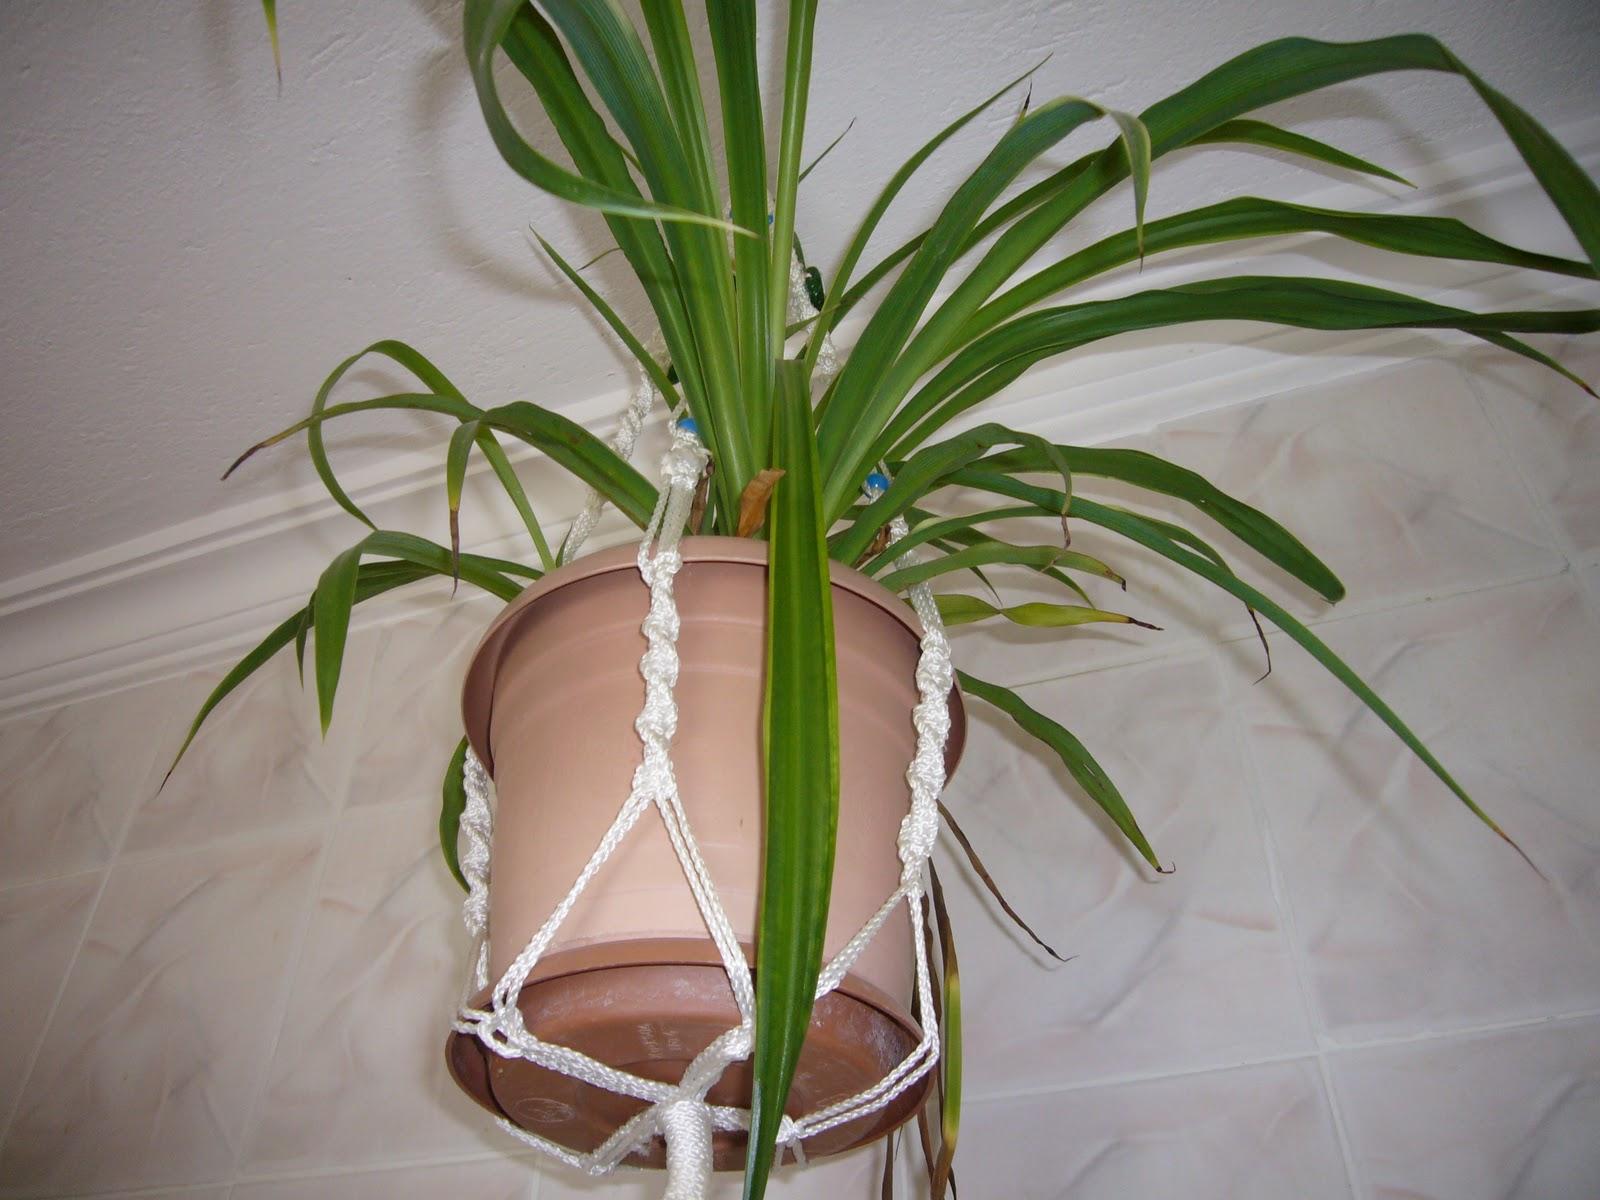 О цветке хлорофитум фото